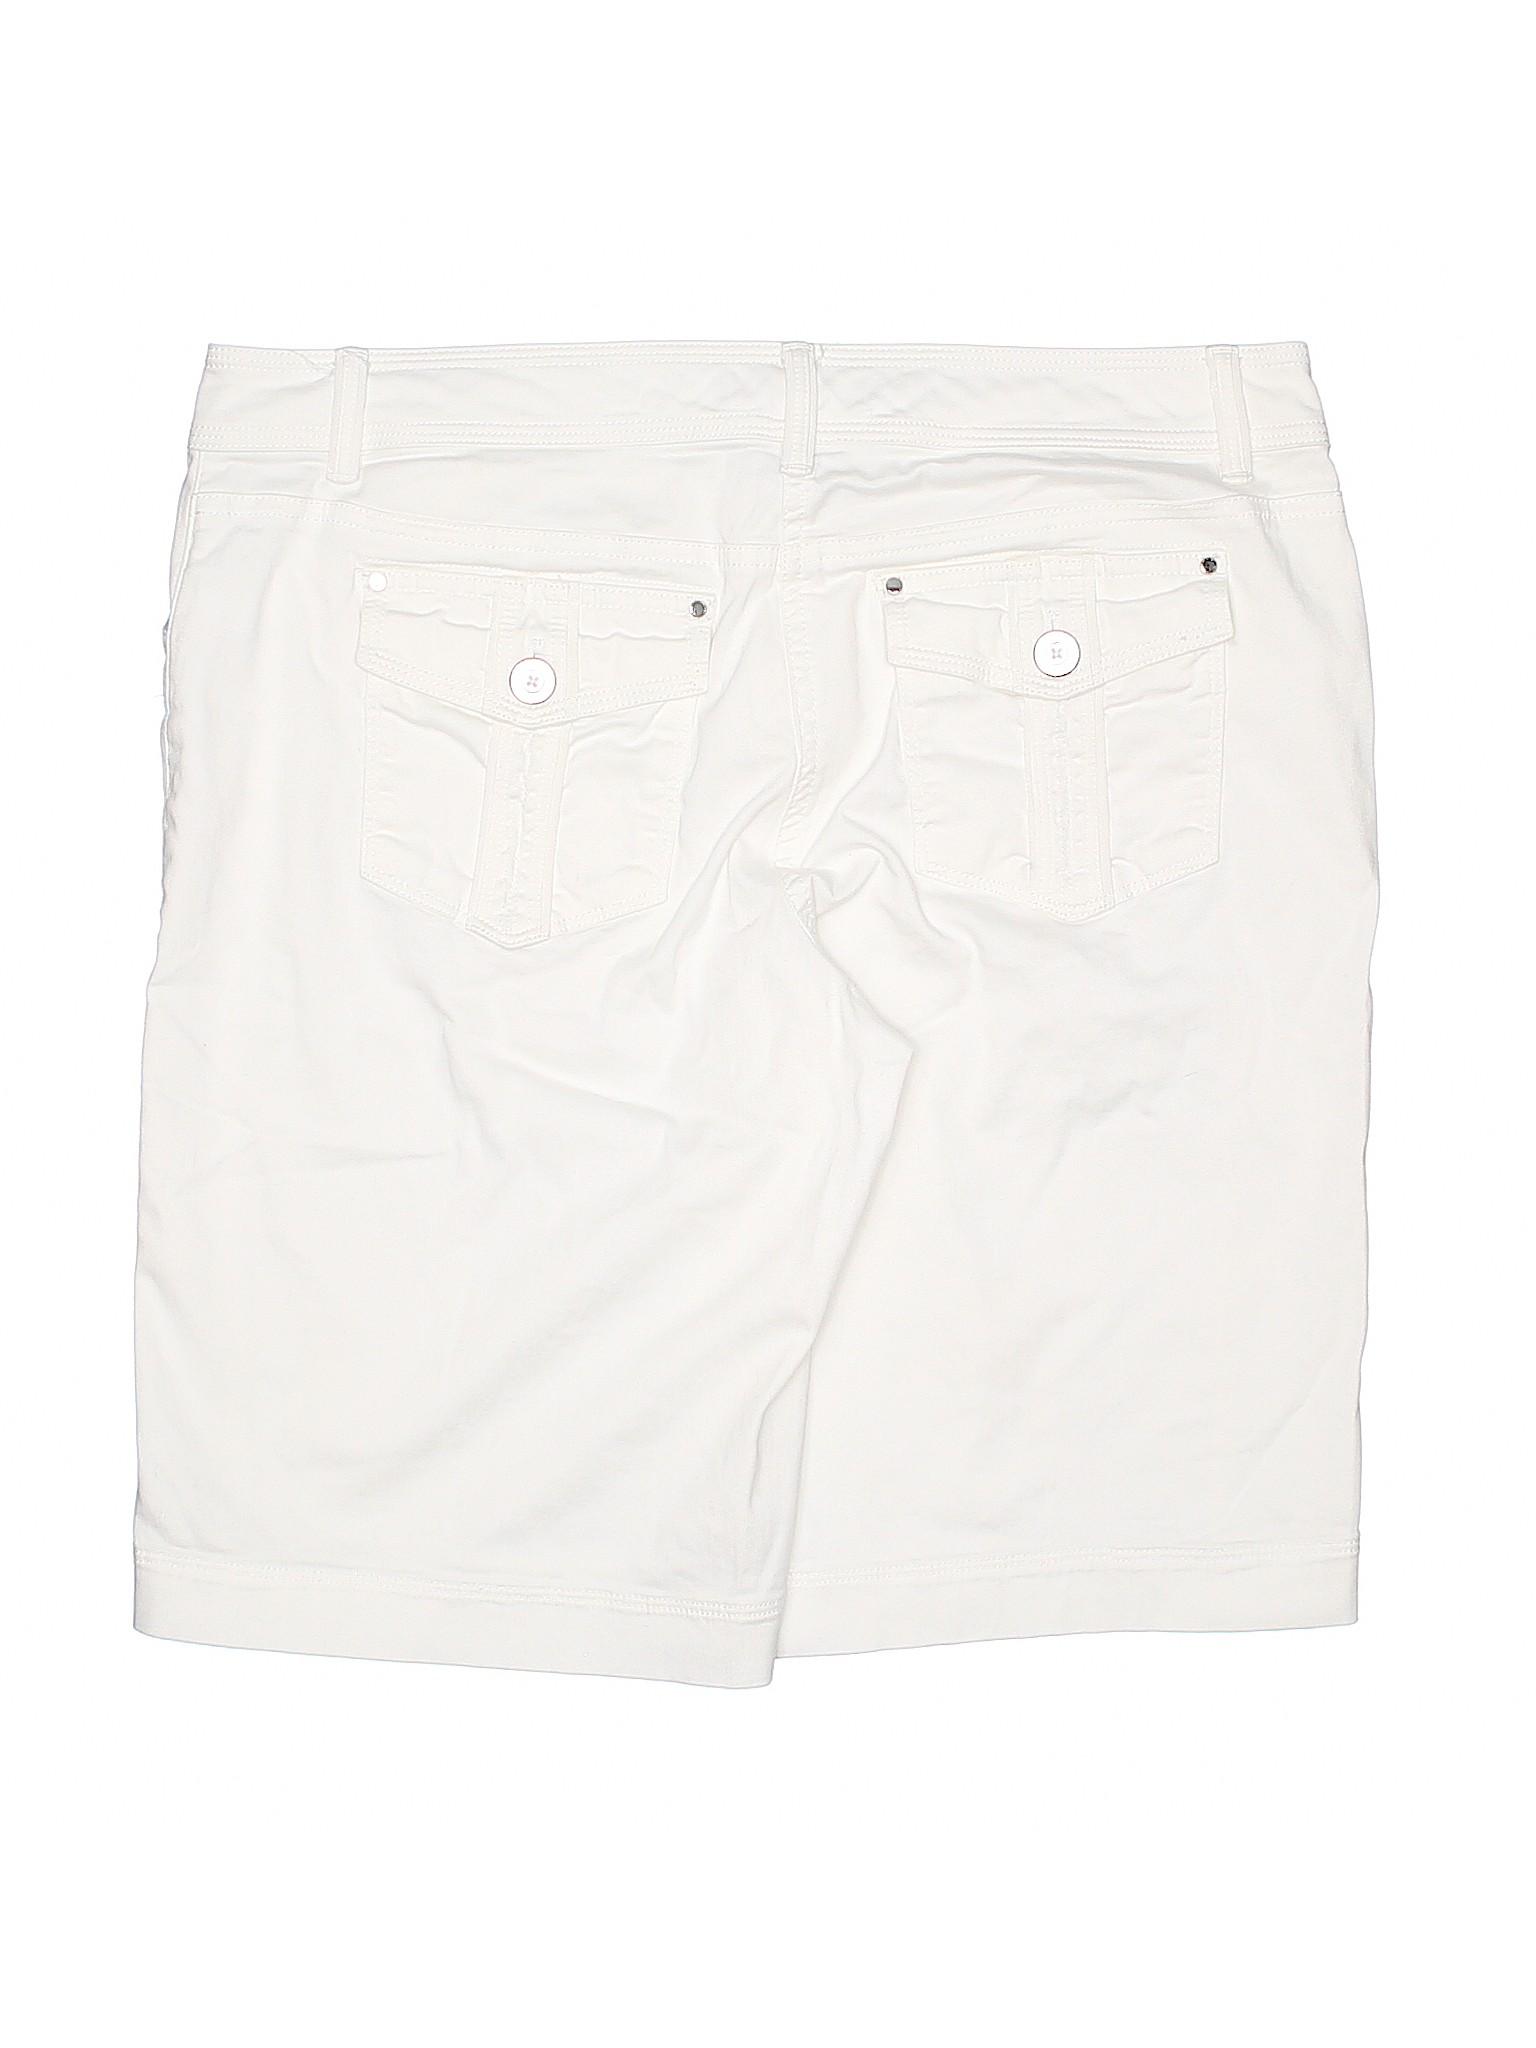 House Market White Shorts Denim Black winter Leisure BgxHnwq4P